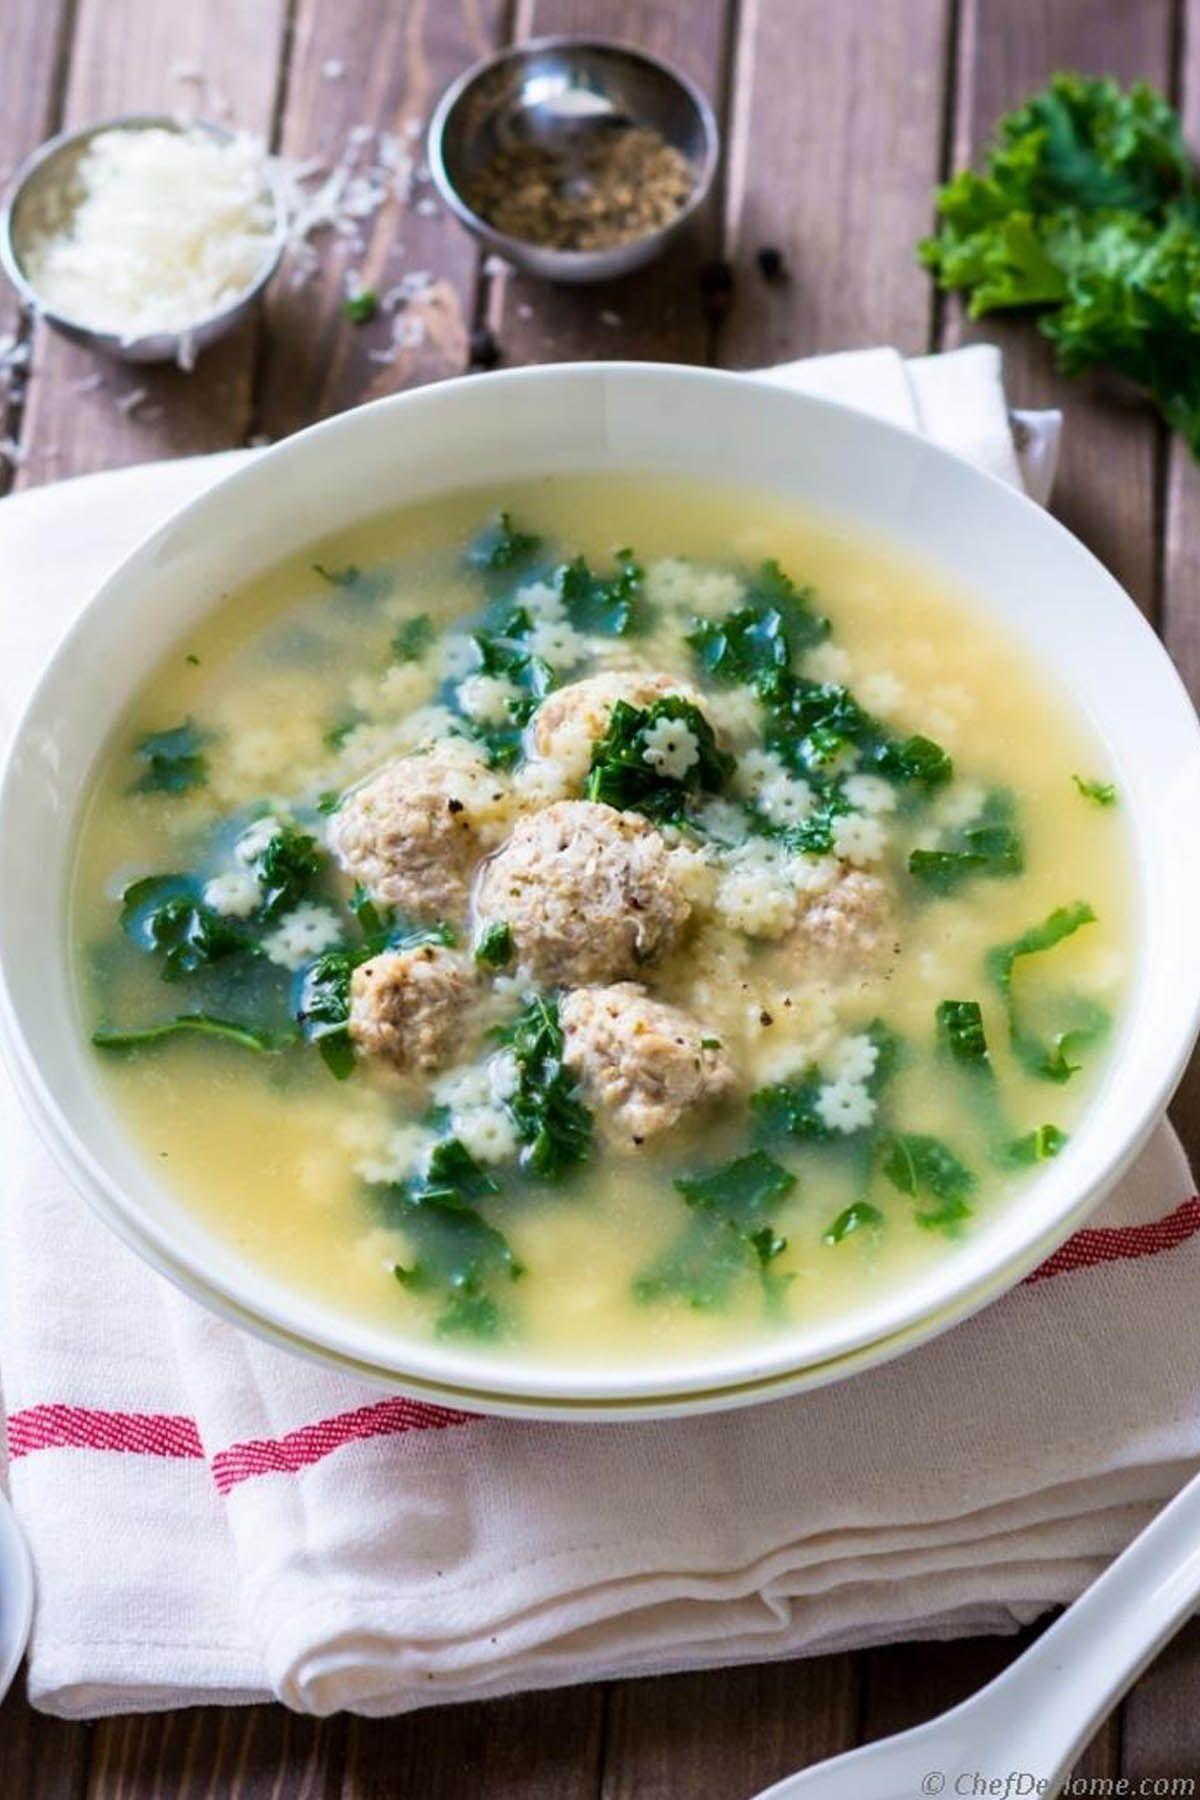 10 Best Italian Wedding Soup Recipes - How to Make Italian Wedding Soup